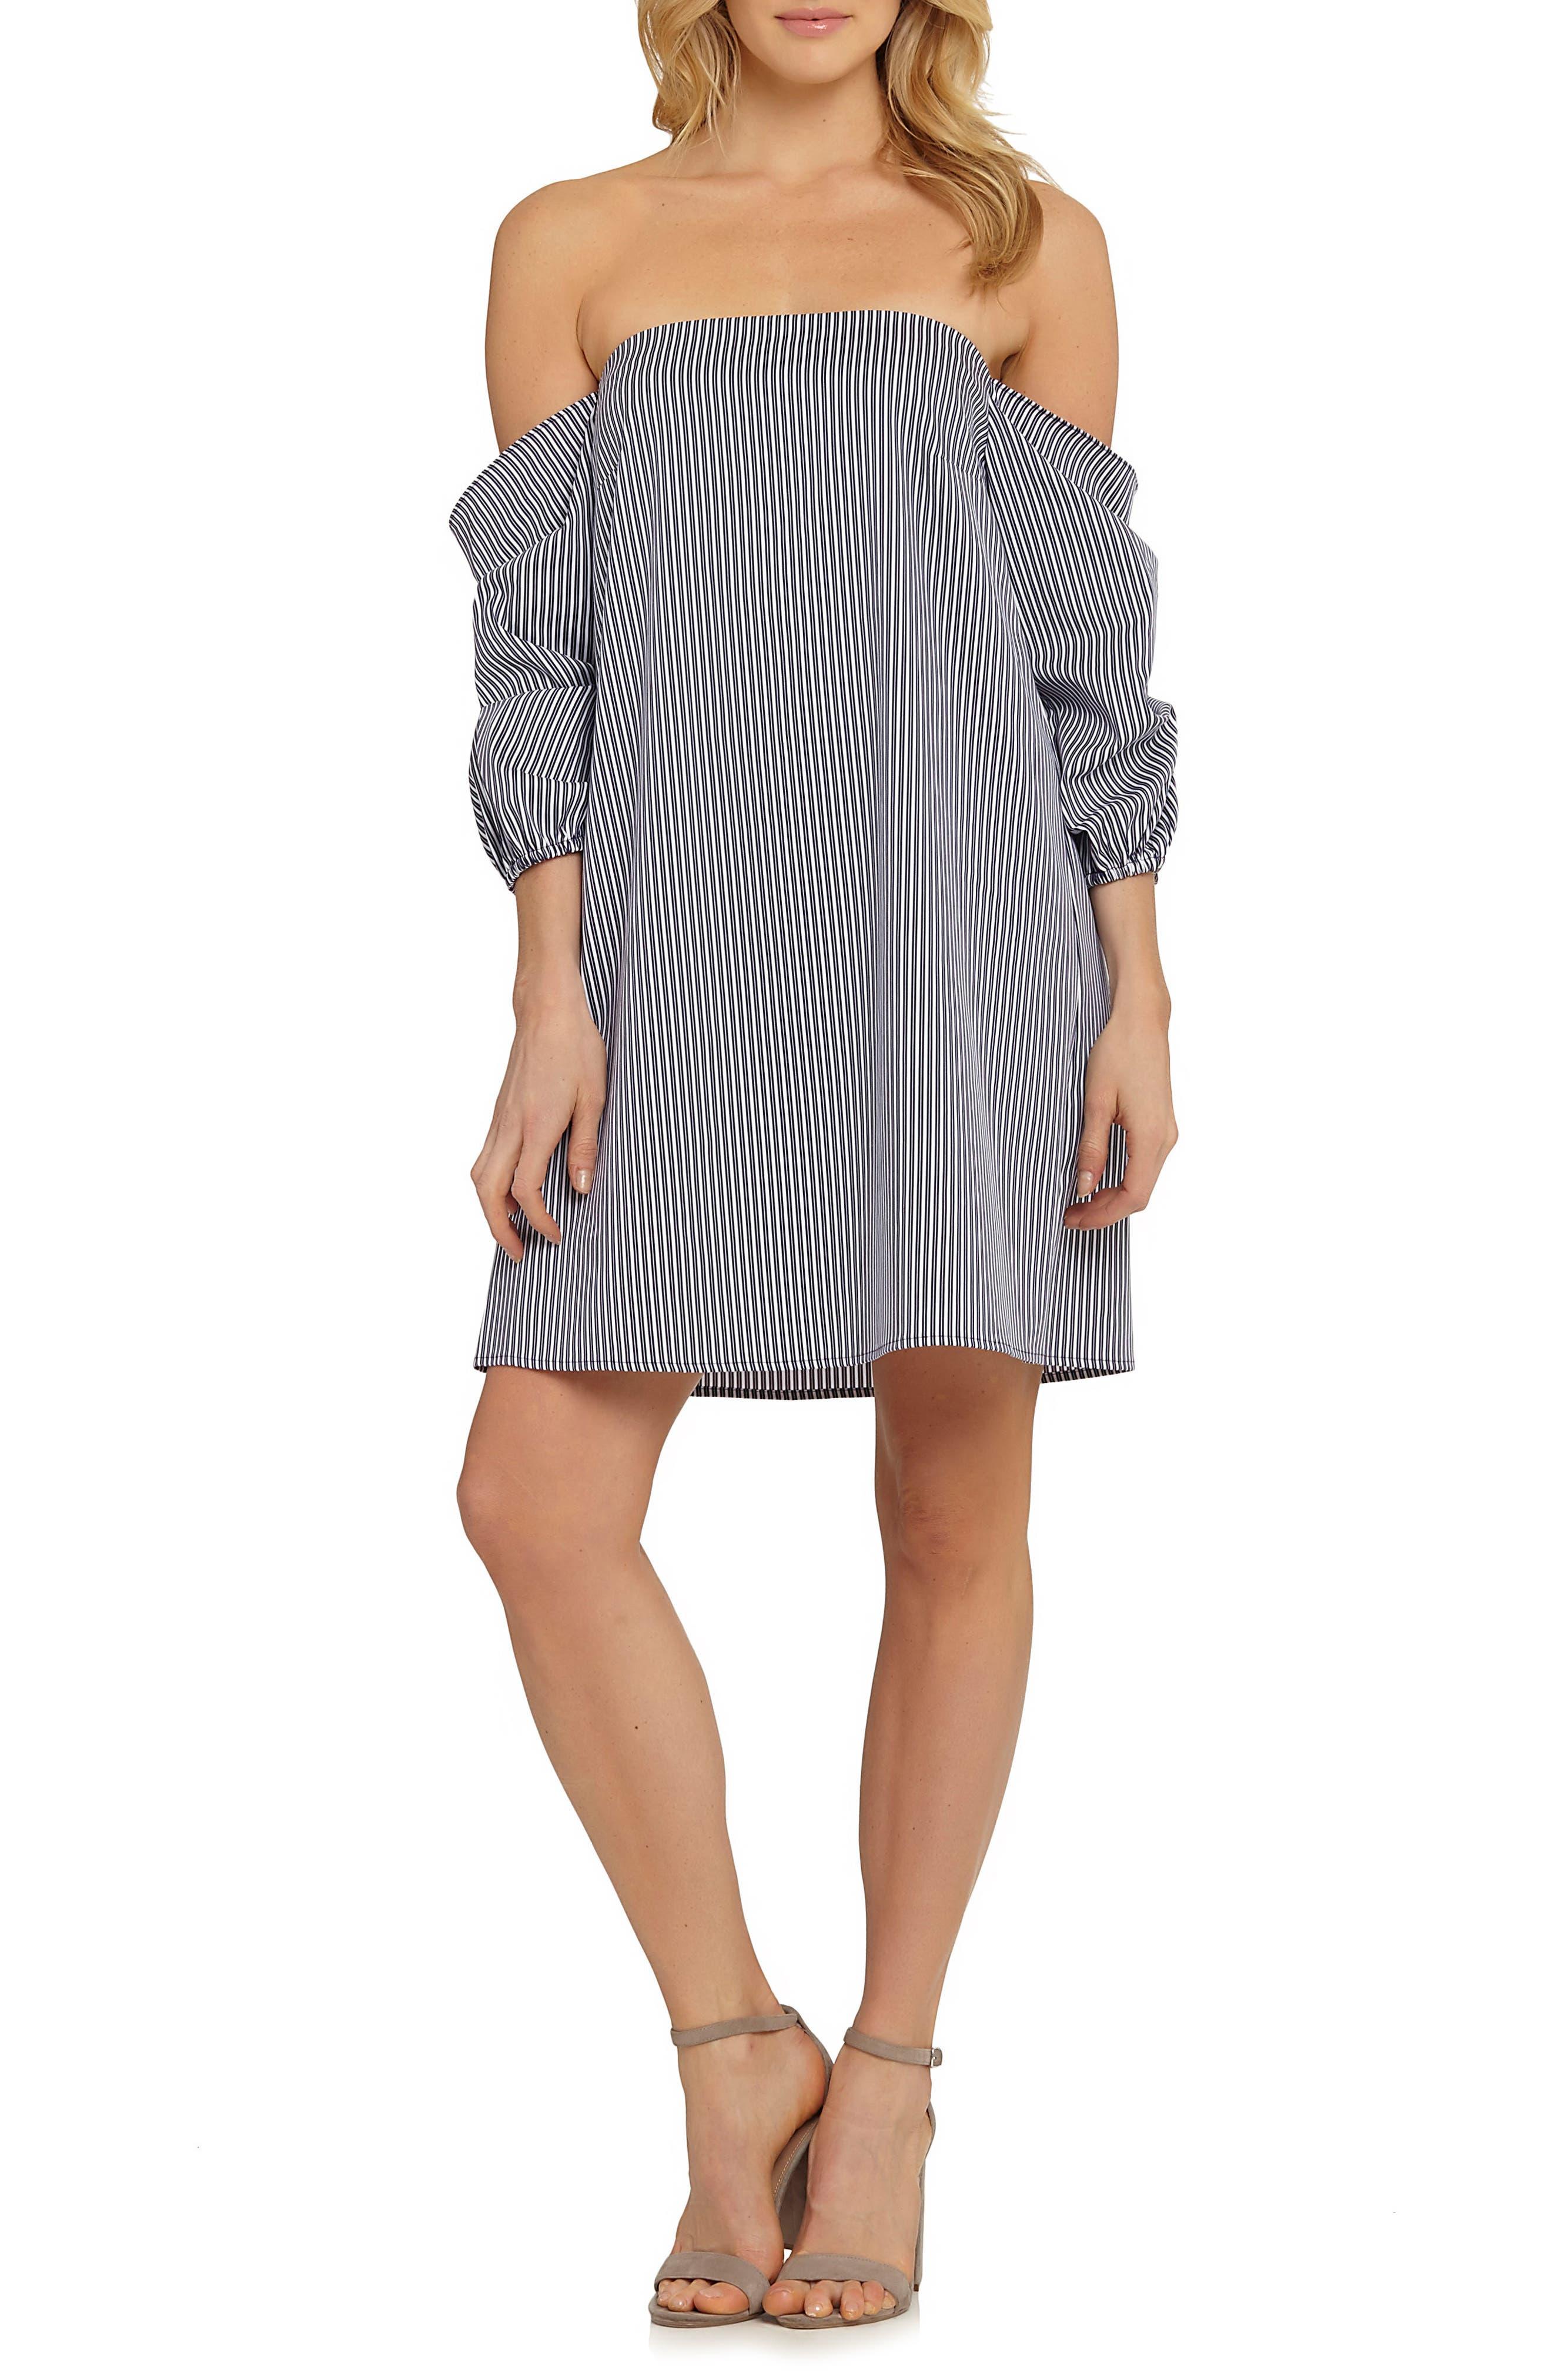 CeCe Brooklyn Stripe Off the Shoulder Dress